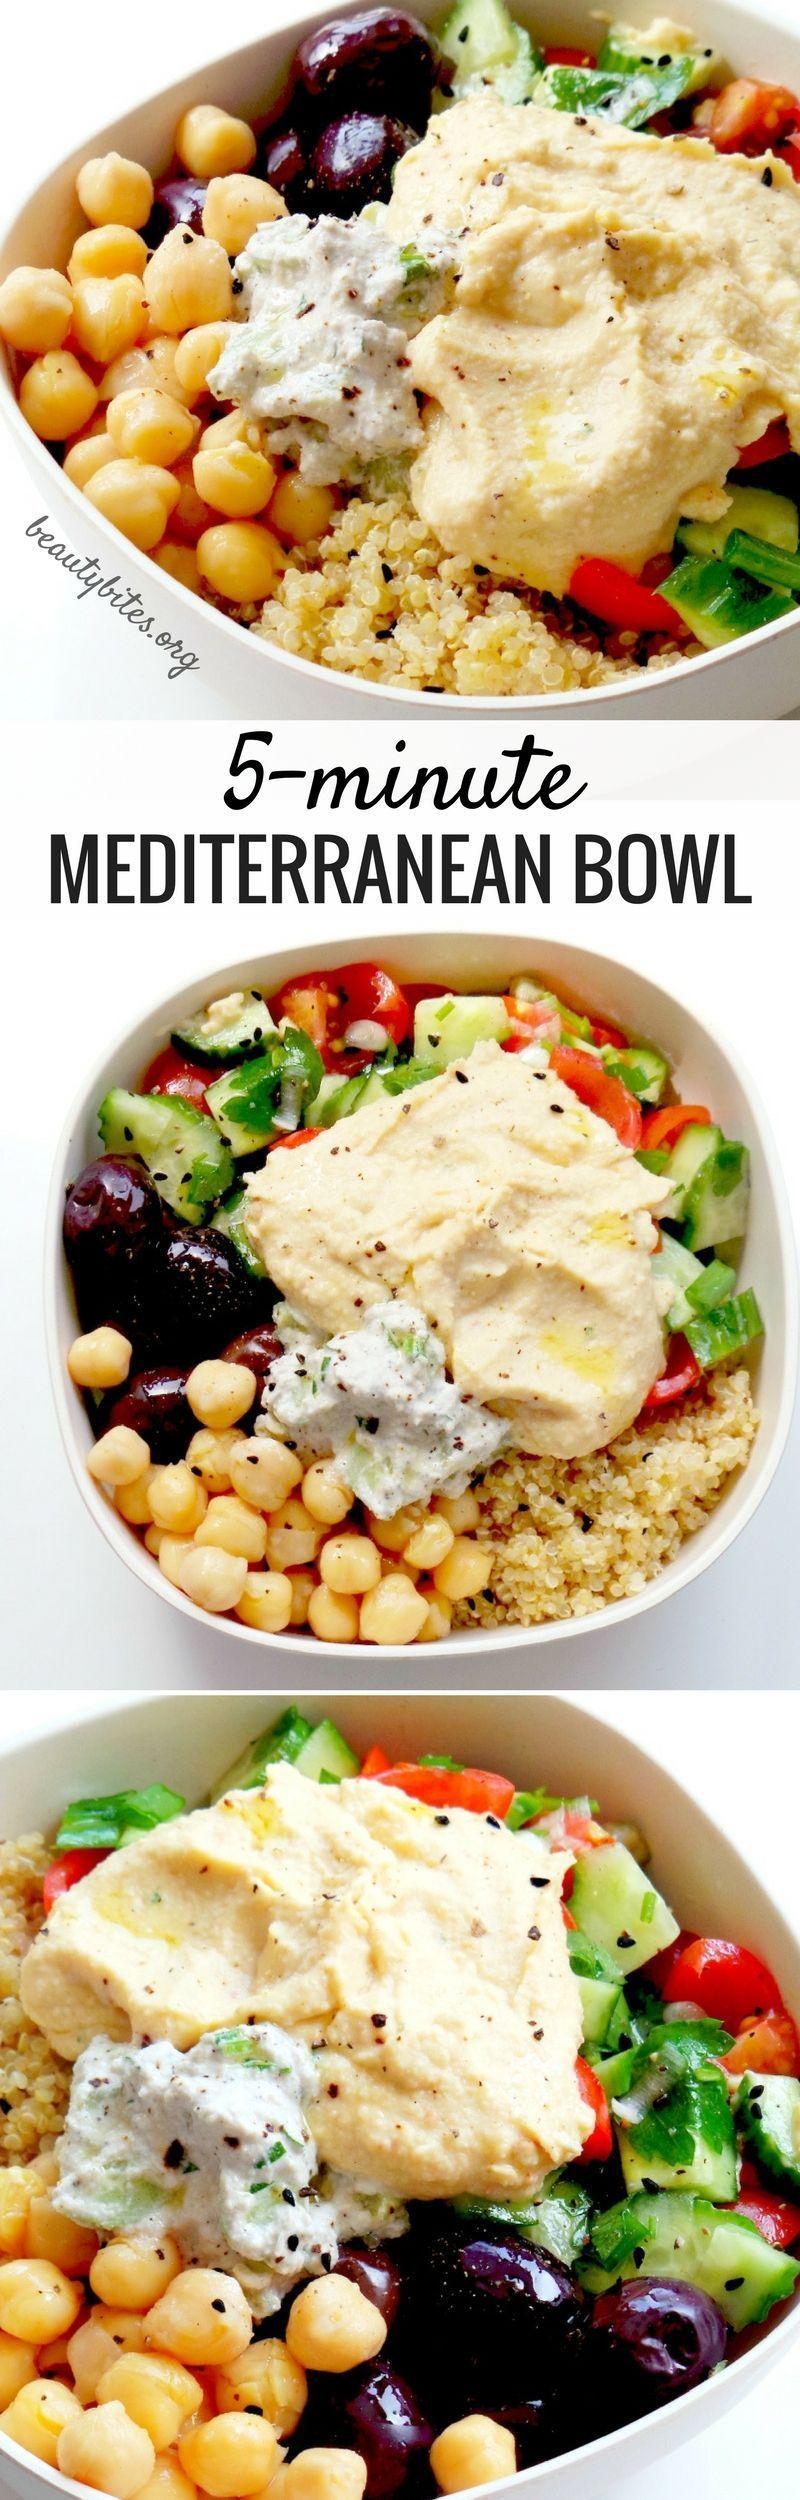 5minütige mediterrane Schüssel  Vegan Meal Prep Recipe  Healthy meal prep  recipe for teens 5minütige mediterrane Schüssel  Vegan Meal Prep Recipe  He...